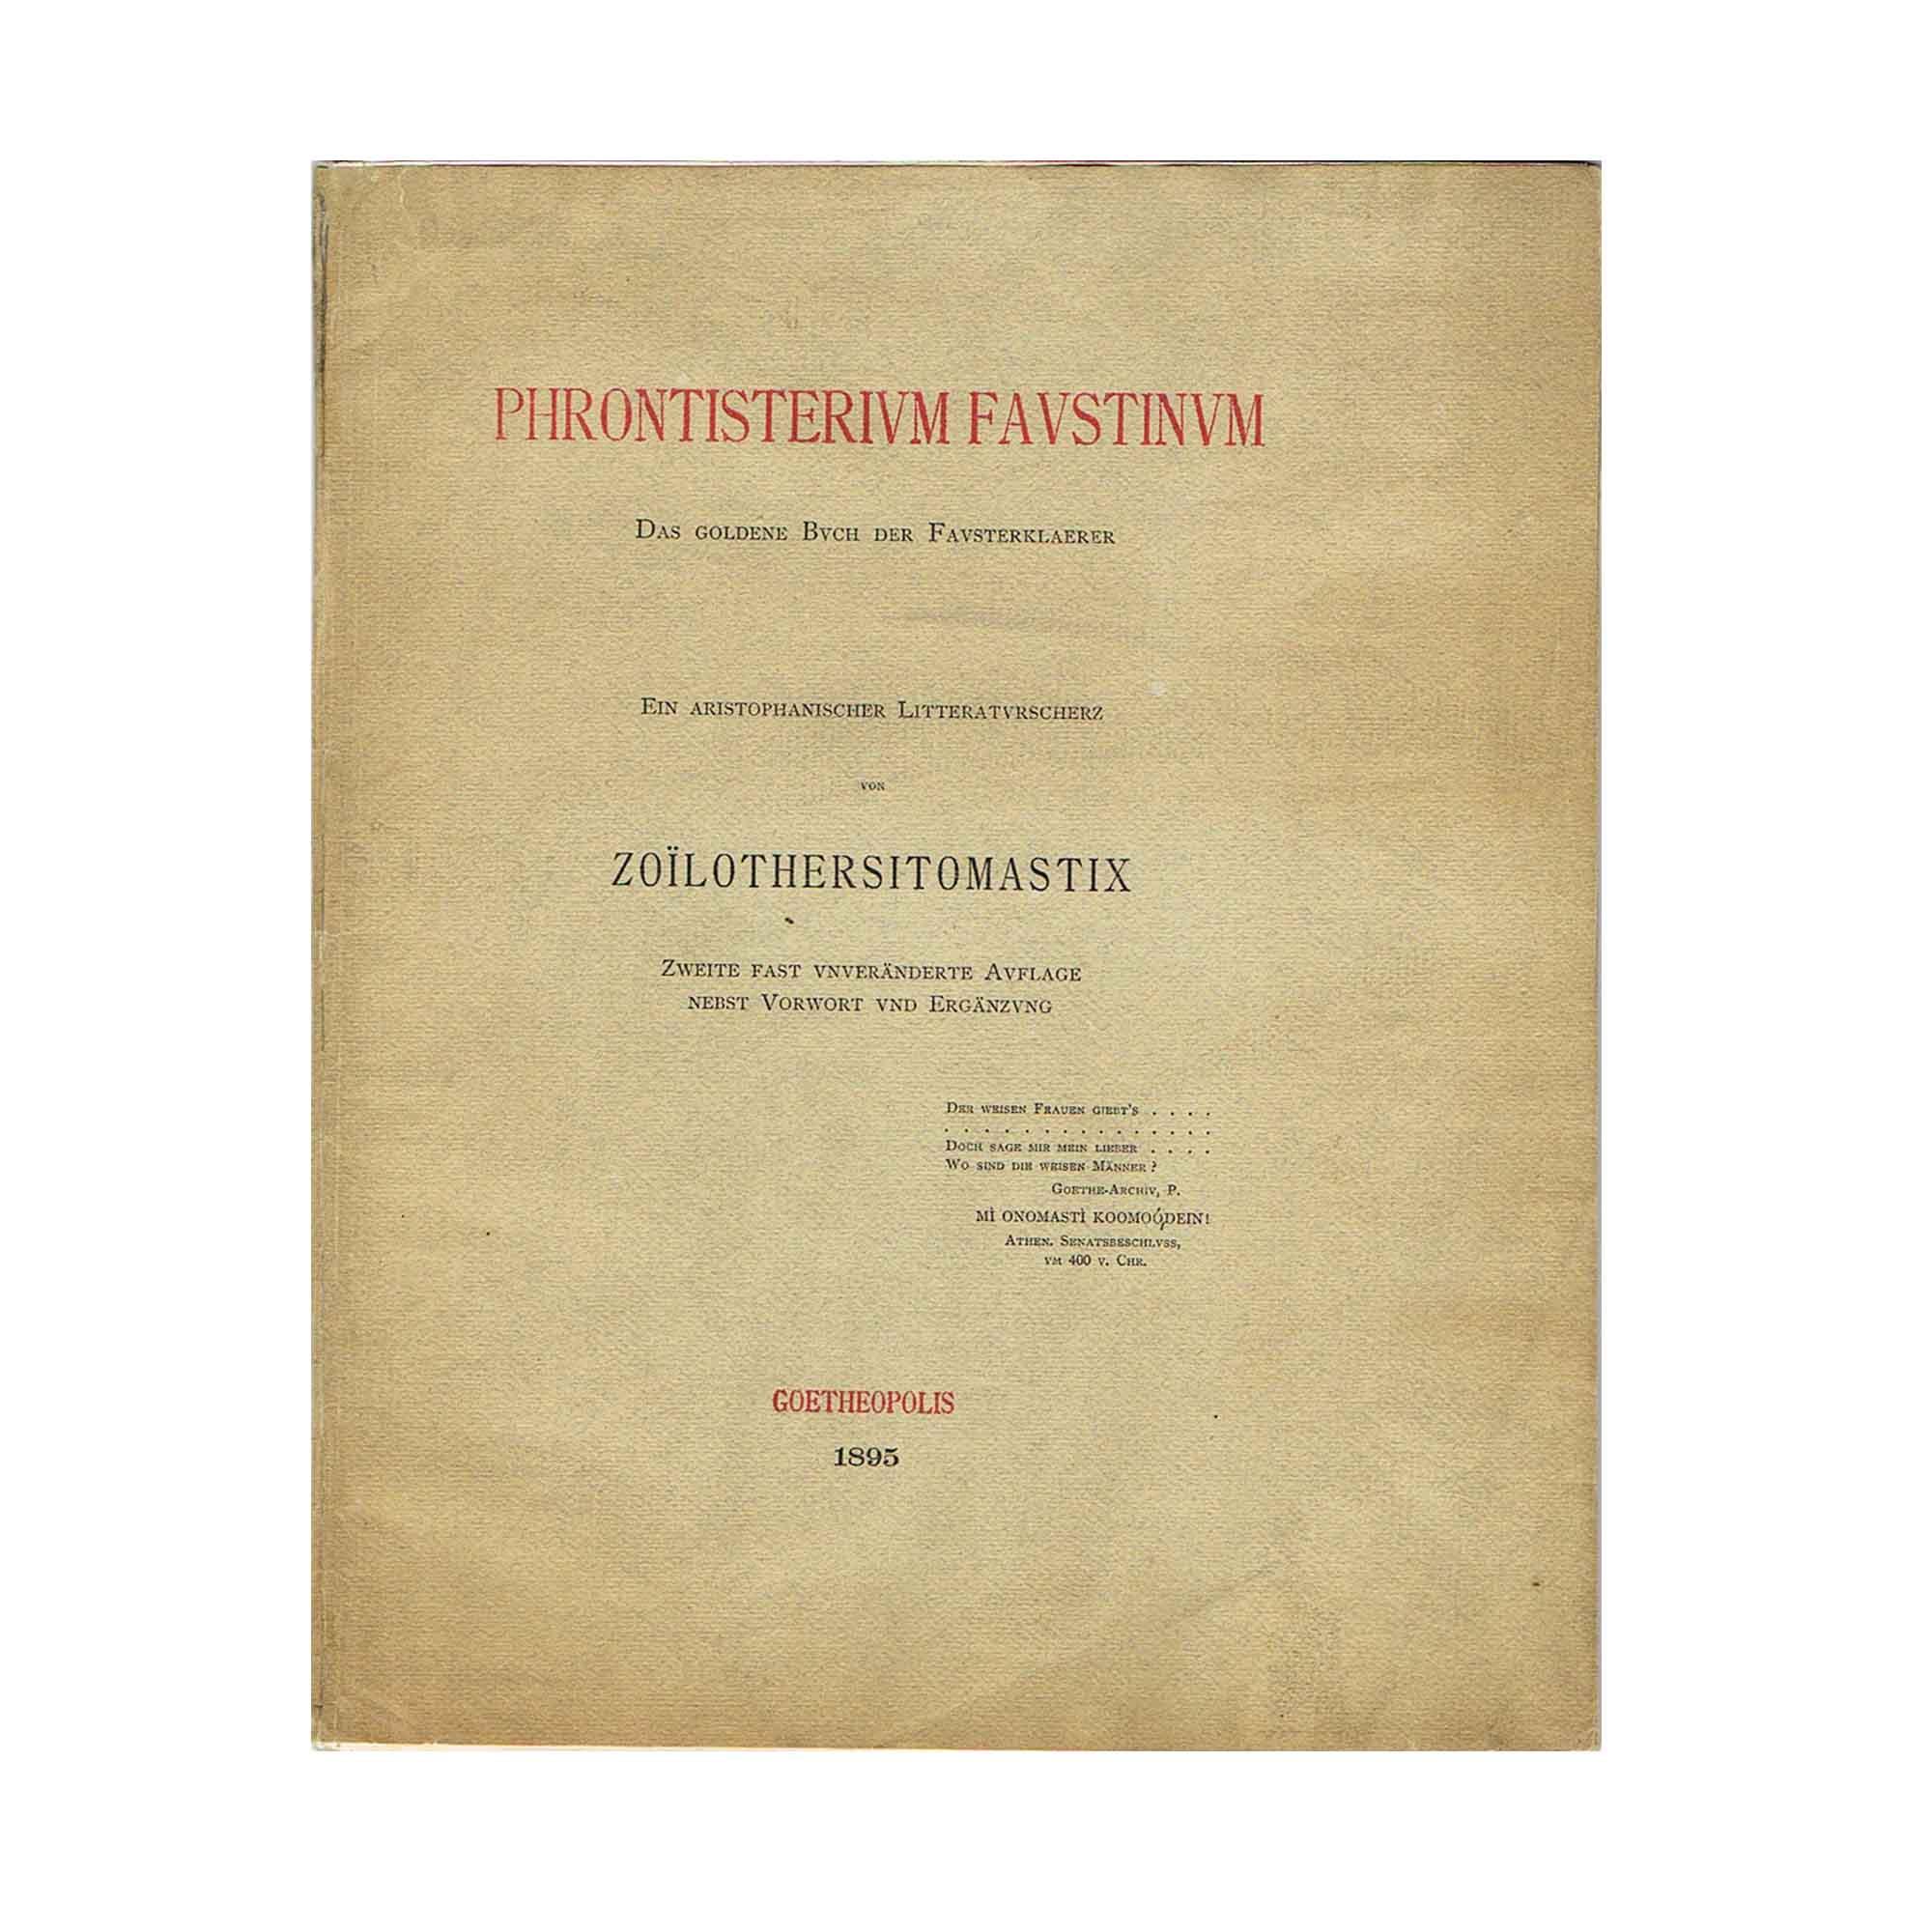 5178-Meltzl-Faust-1895-N.jpeg